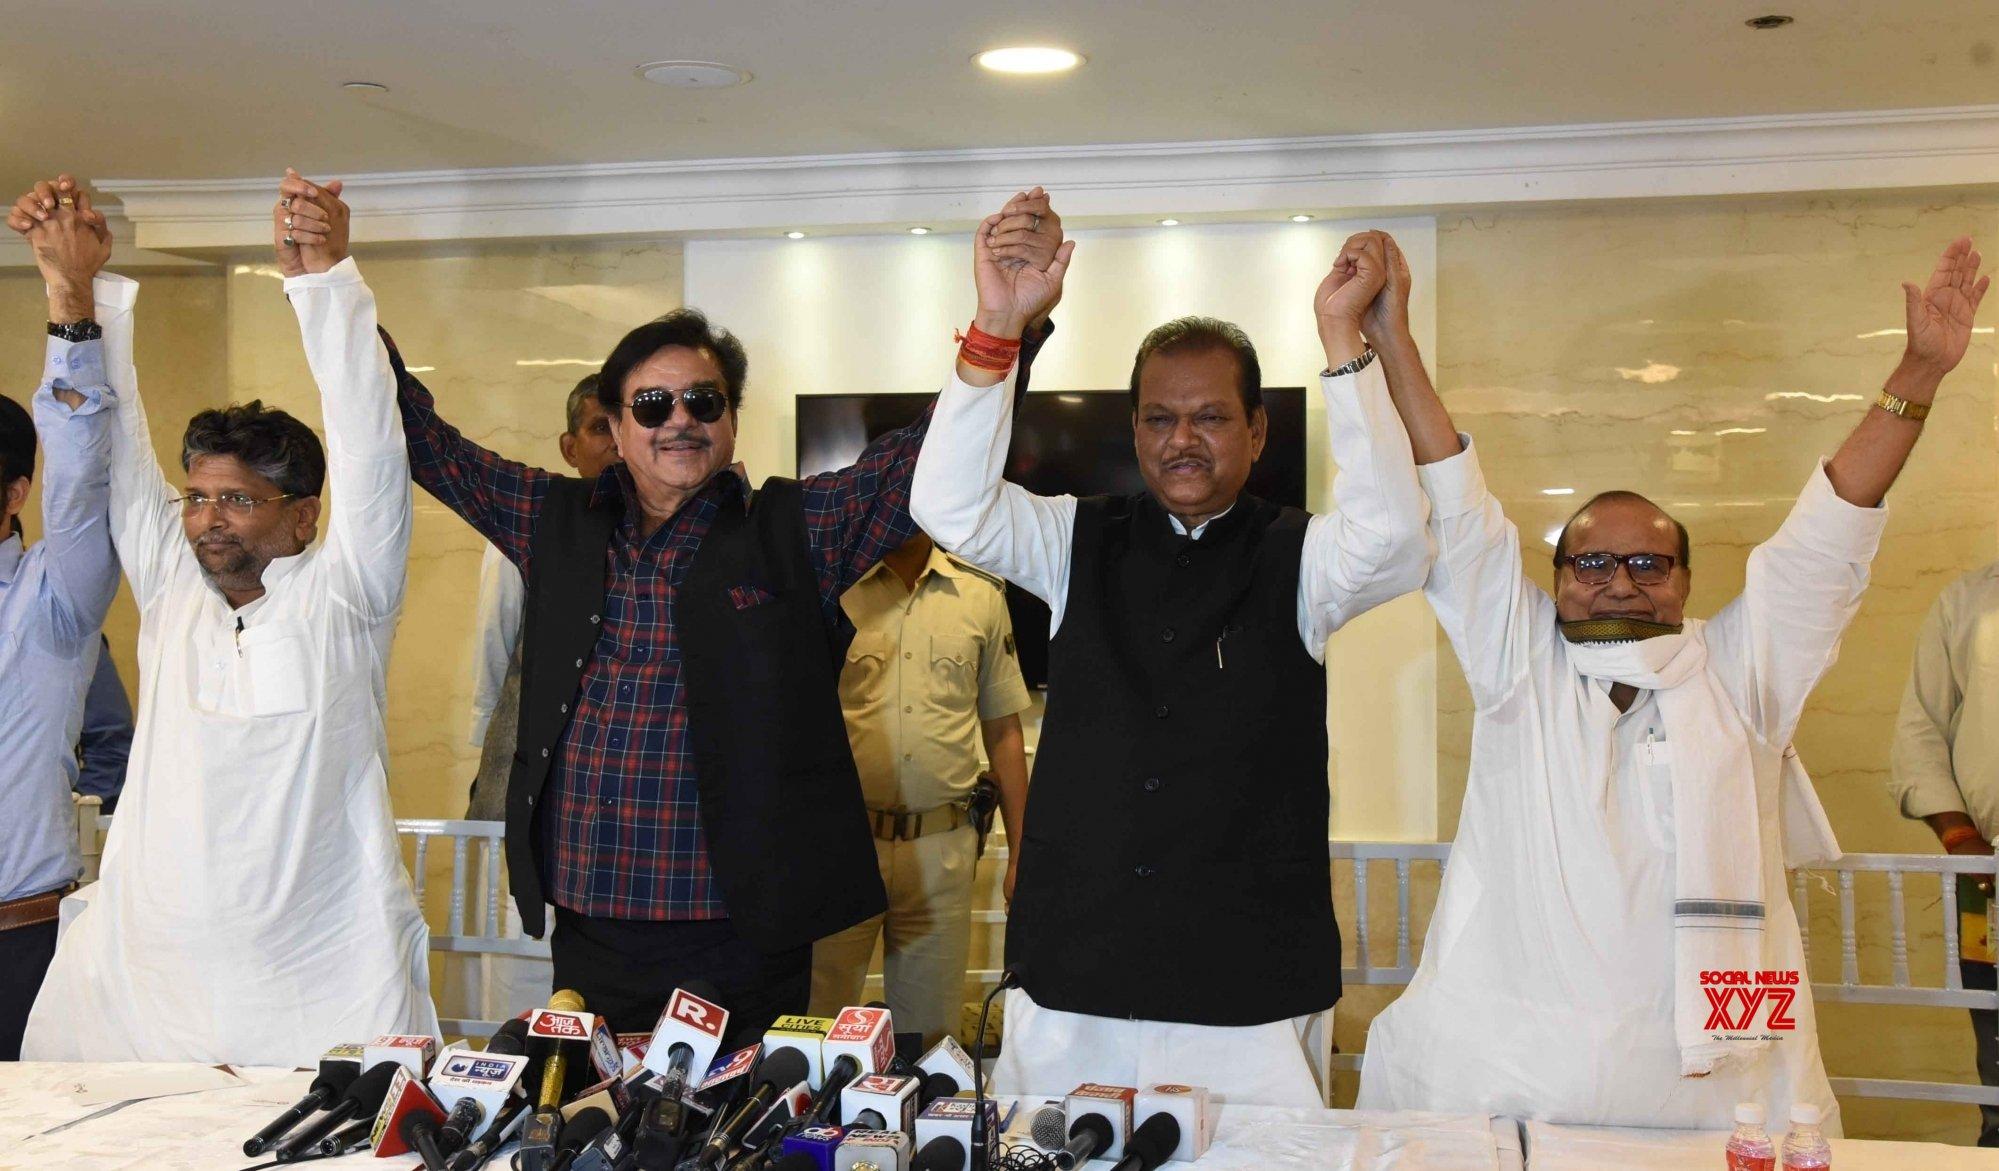 Patna: Shatrughan Sinha's press conference #Gallery